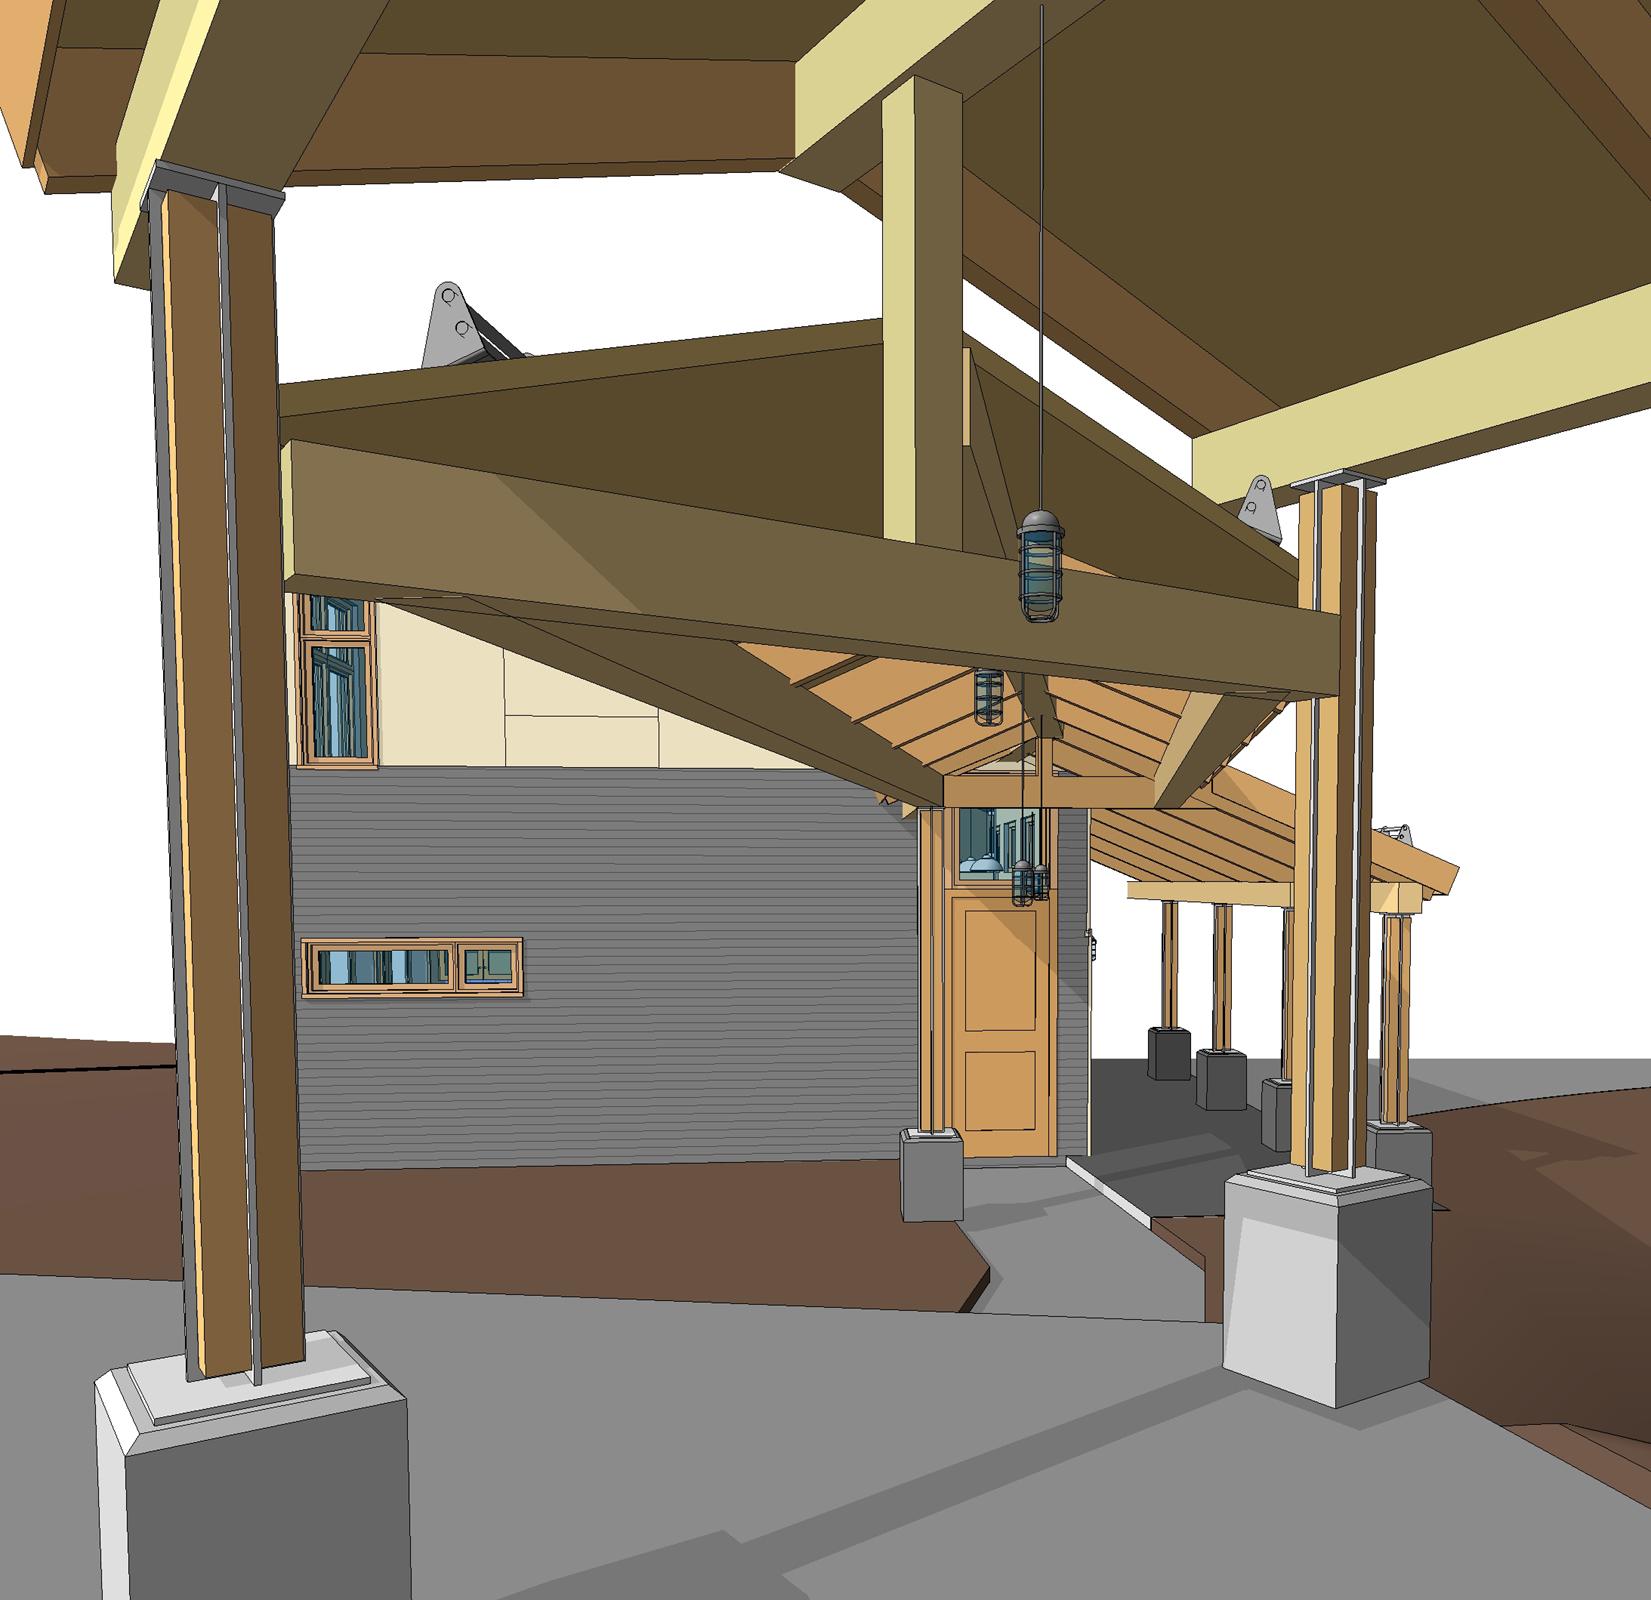 Canopy2.jpg